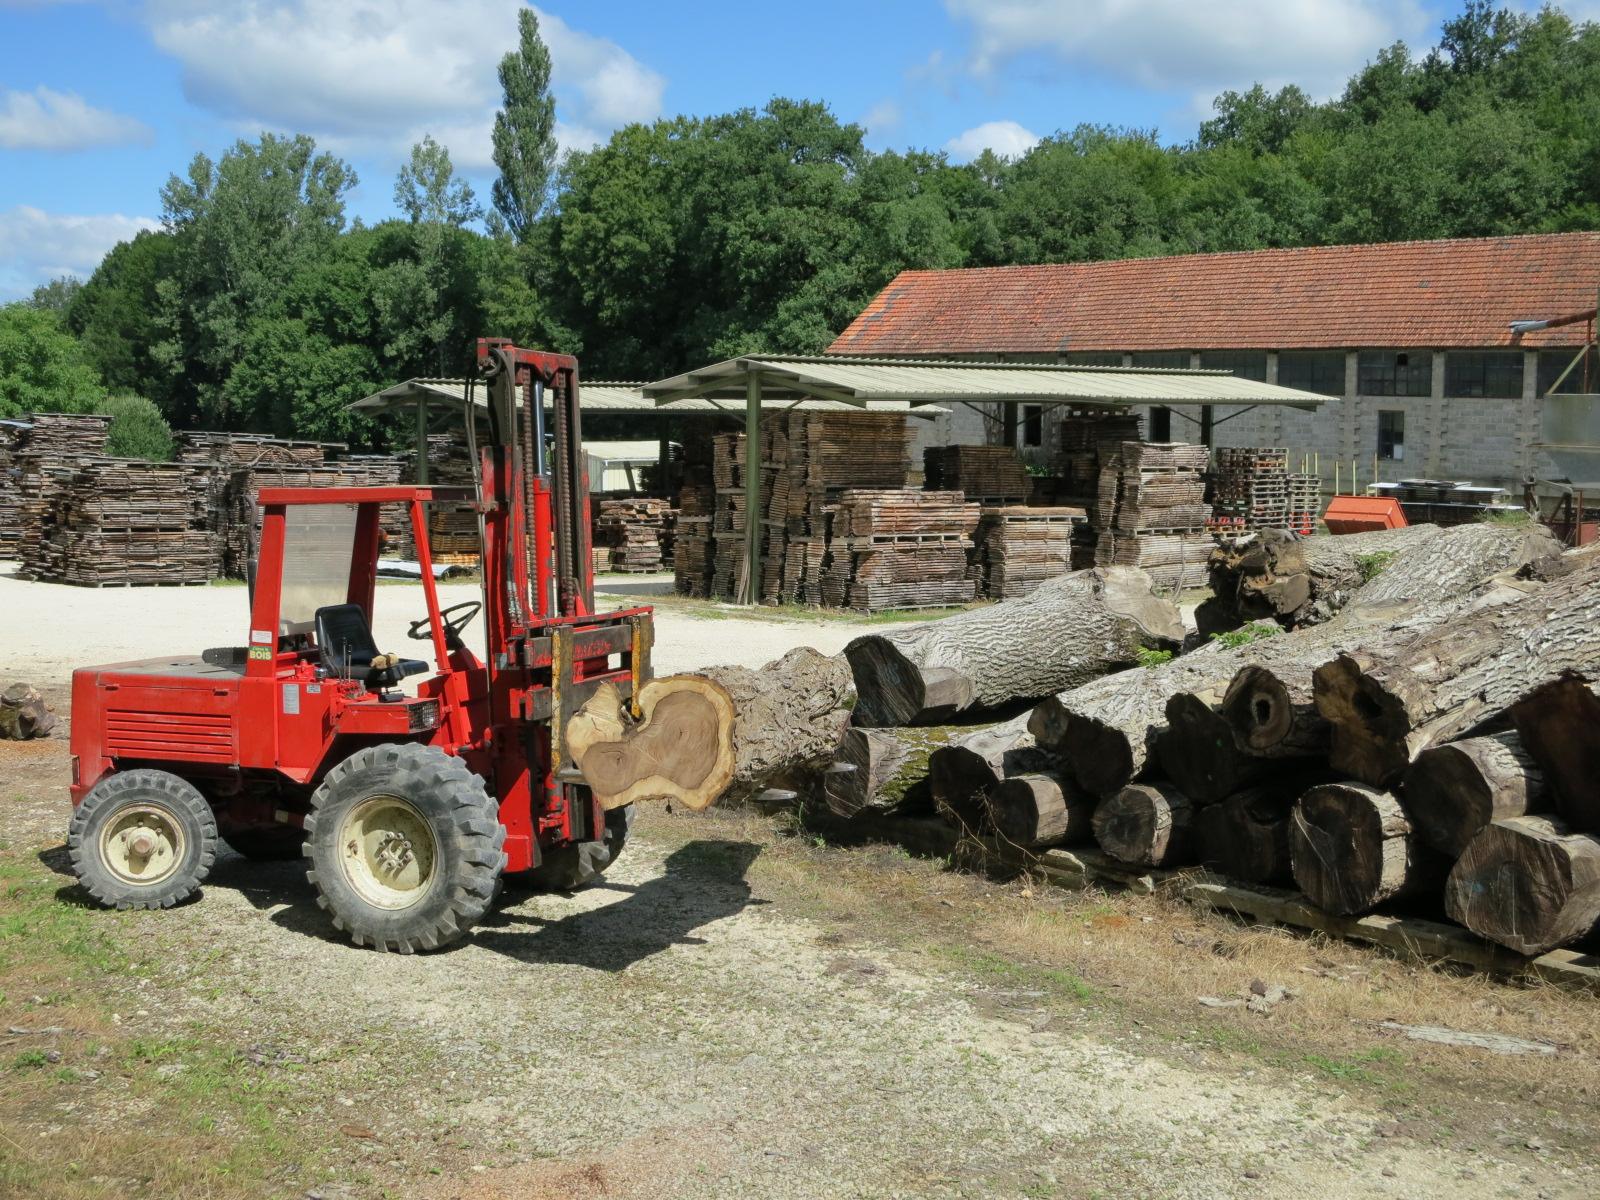 Selecting walnut trunks